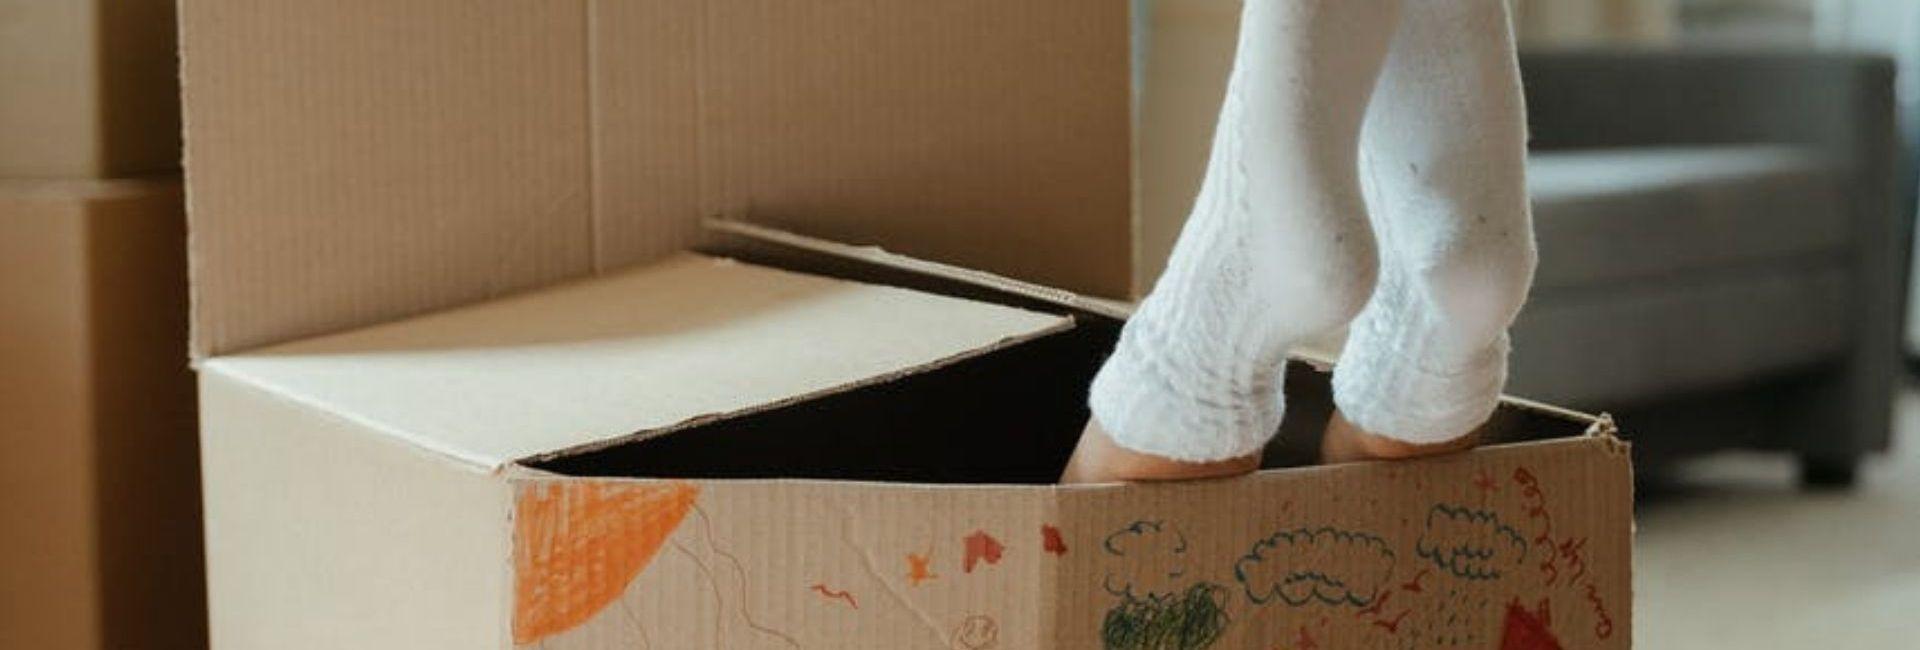 enfant-carton-pieds